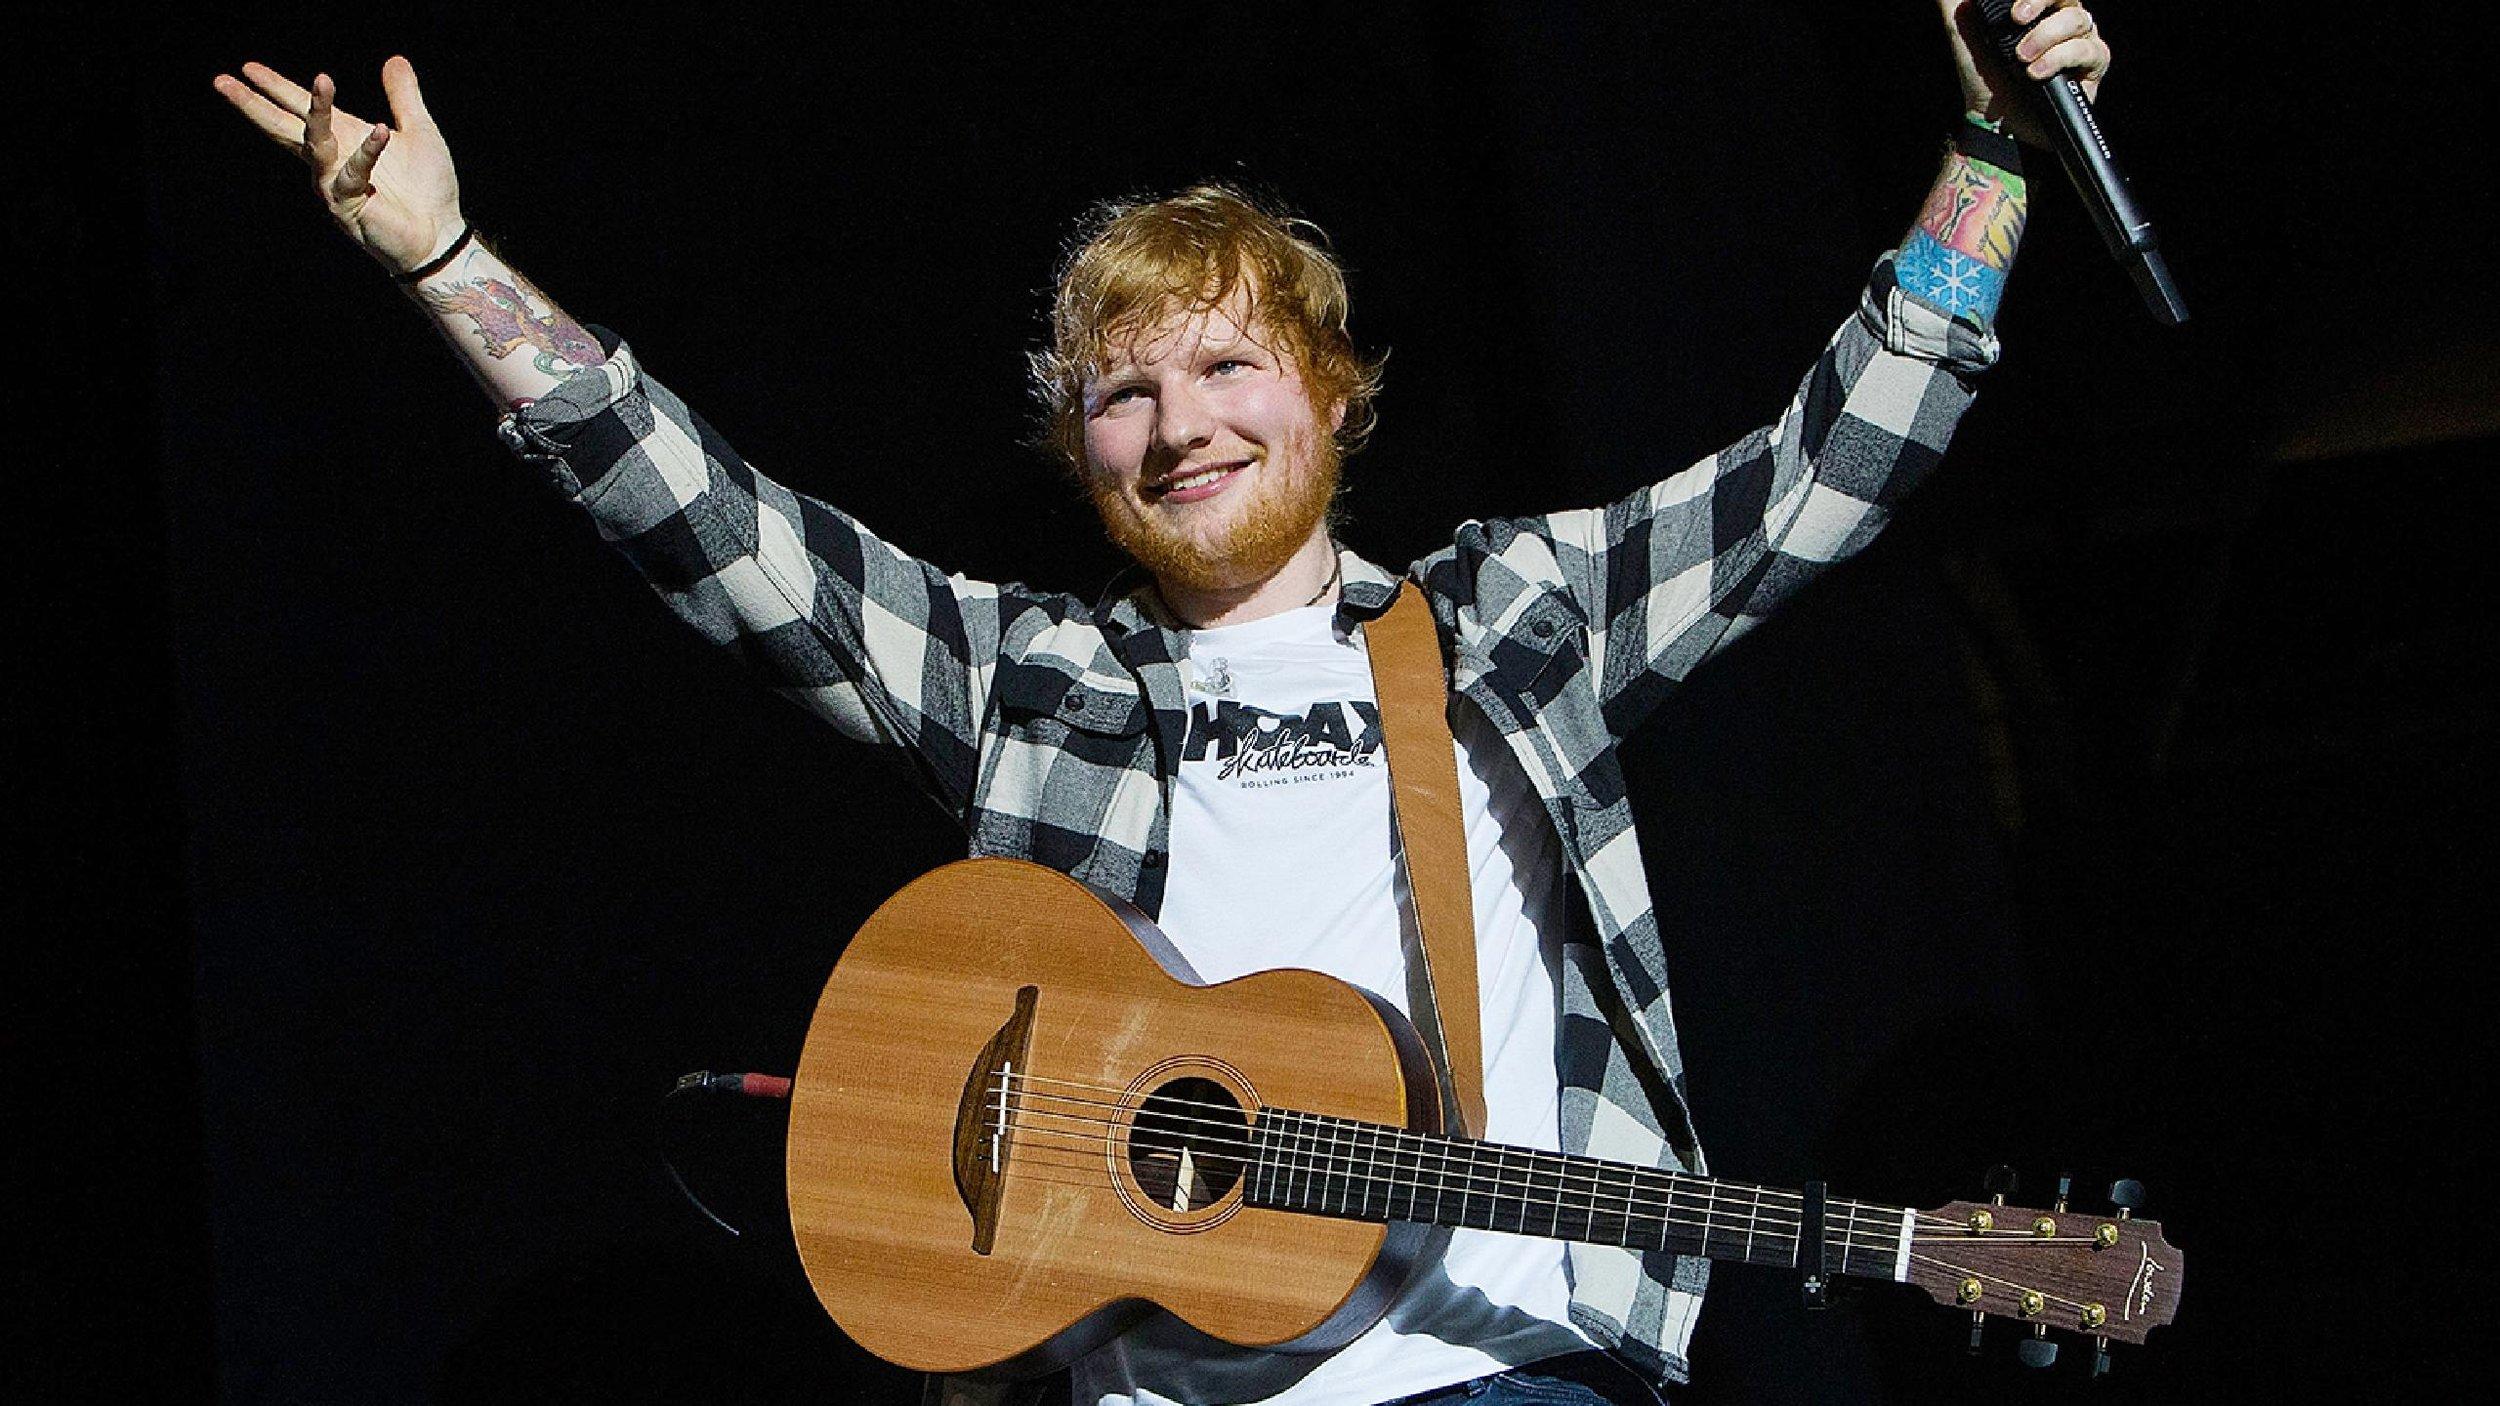 Photography: Ed Sheeran